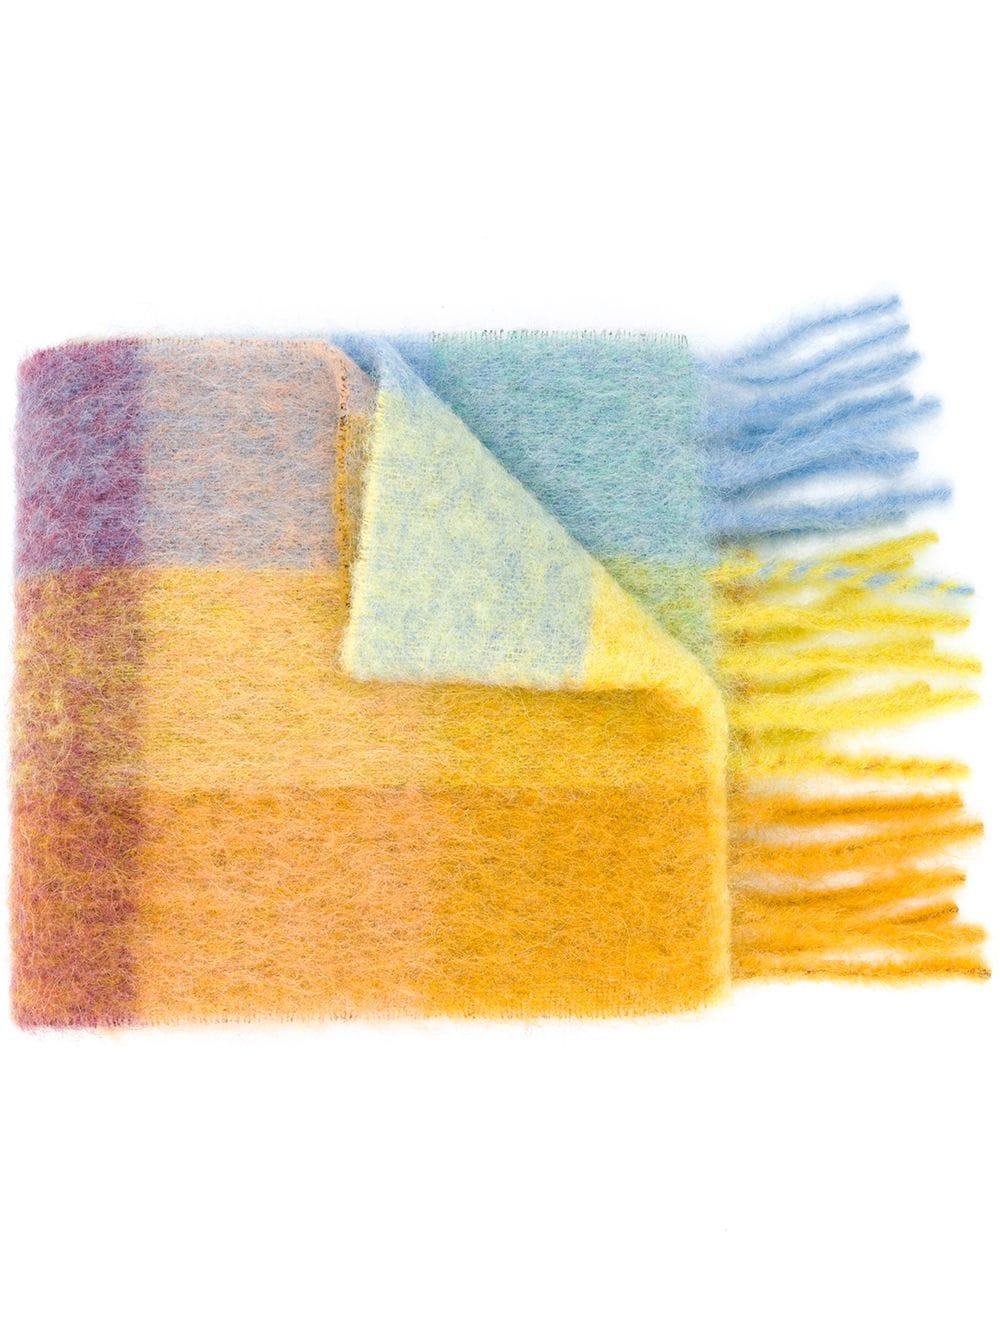 Acne Studios, multi-check fringed scarf, 470лв